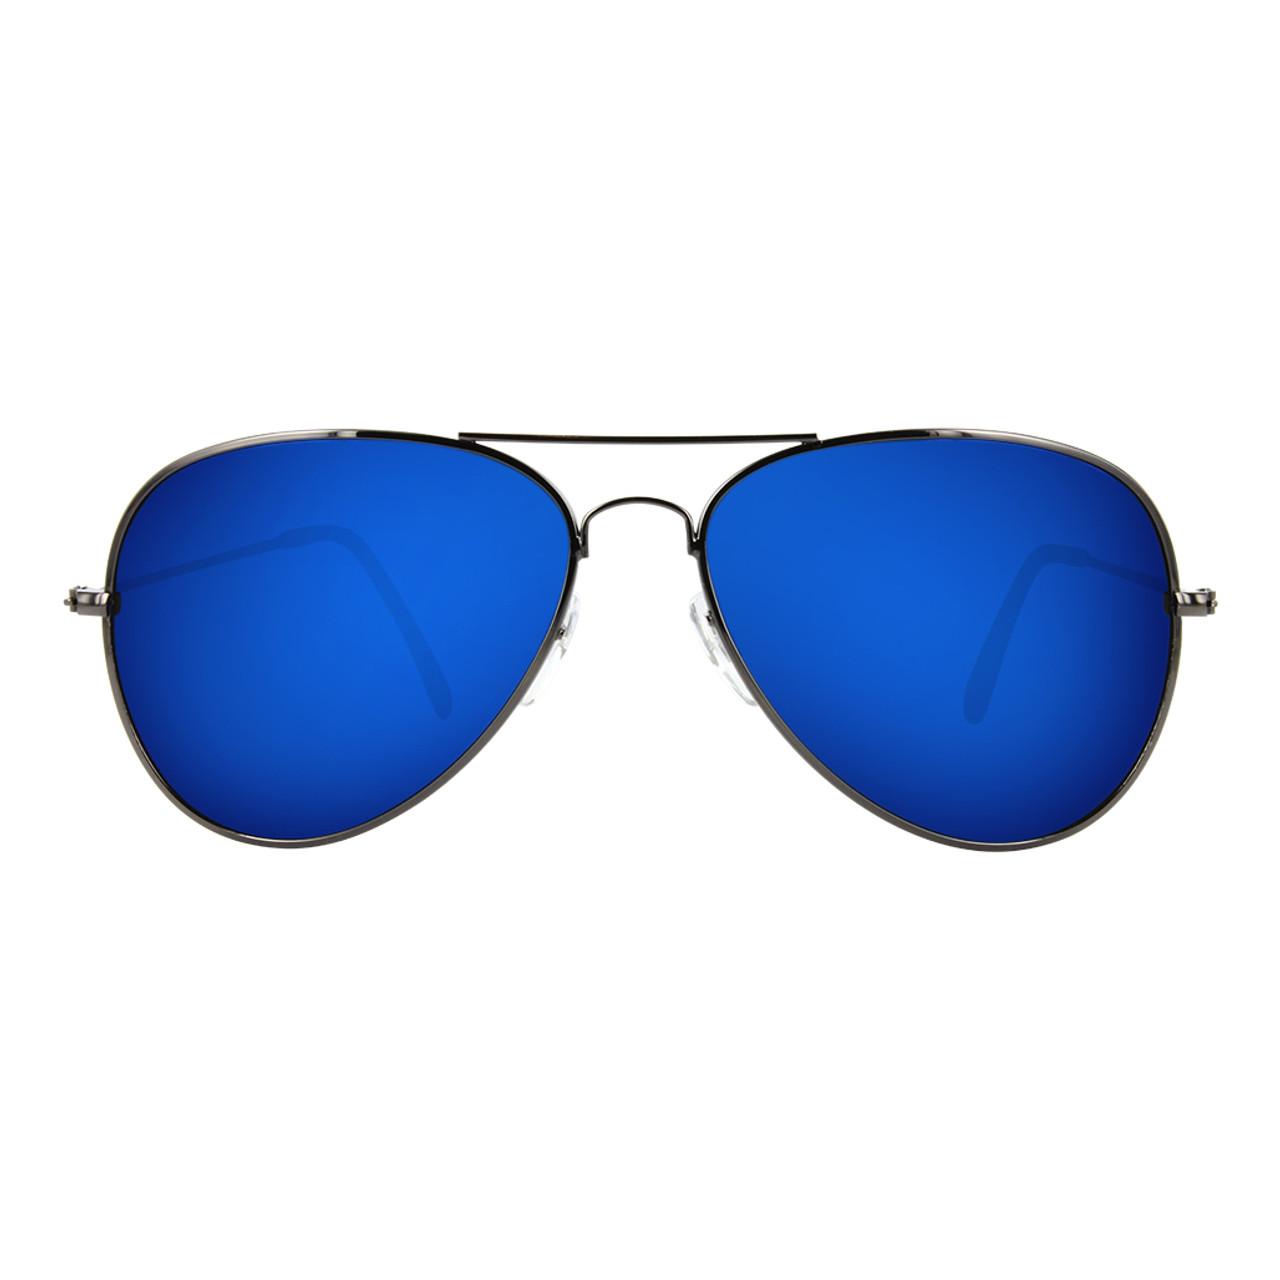 GEEK COUTURE Aviator Sunglasses Blue Mirror